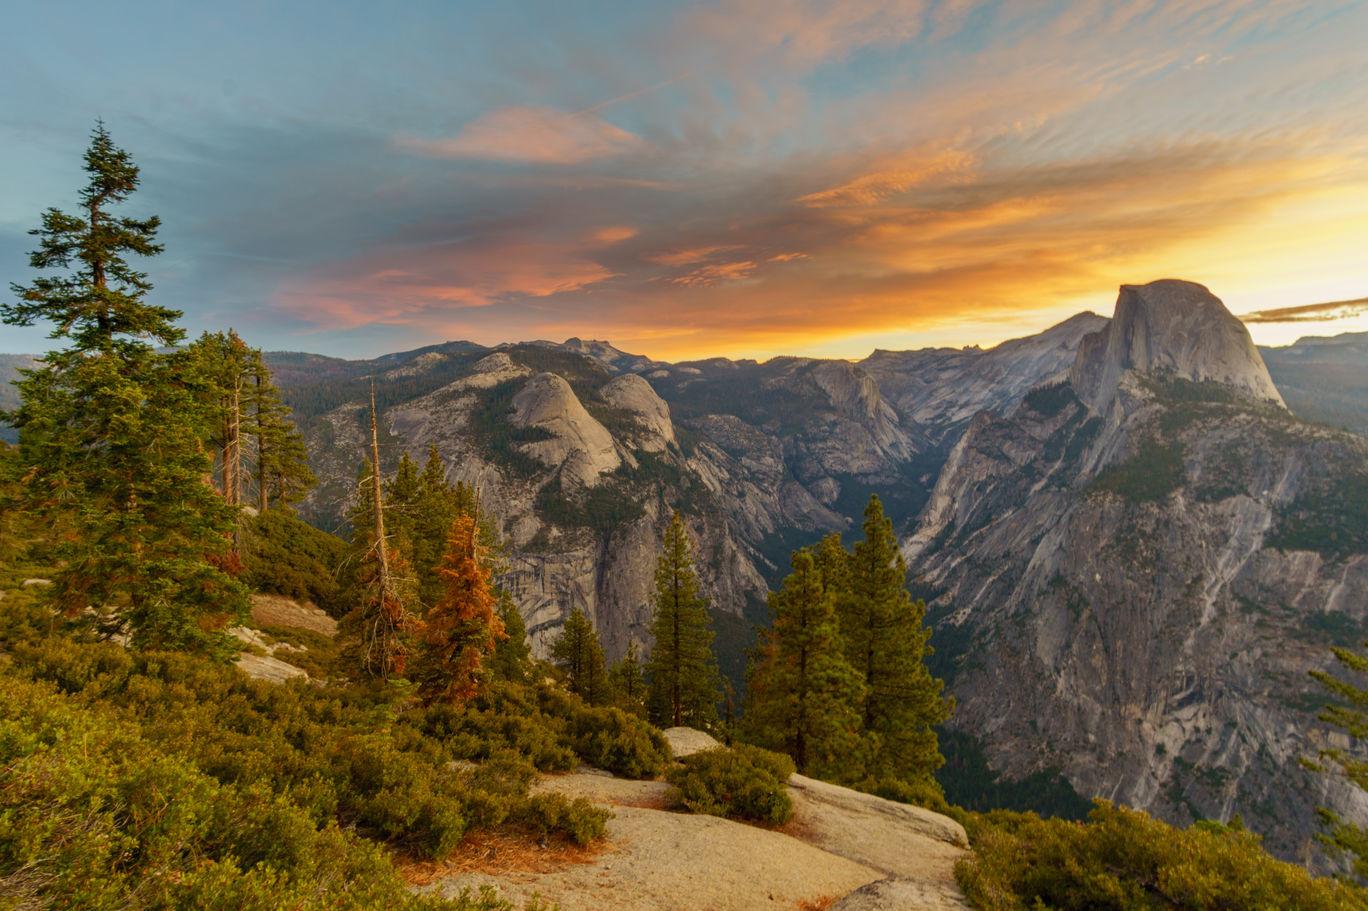 Photo of Yosemite Valley By Sandeep Sreedhar